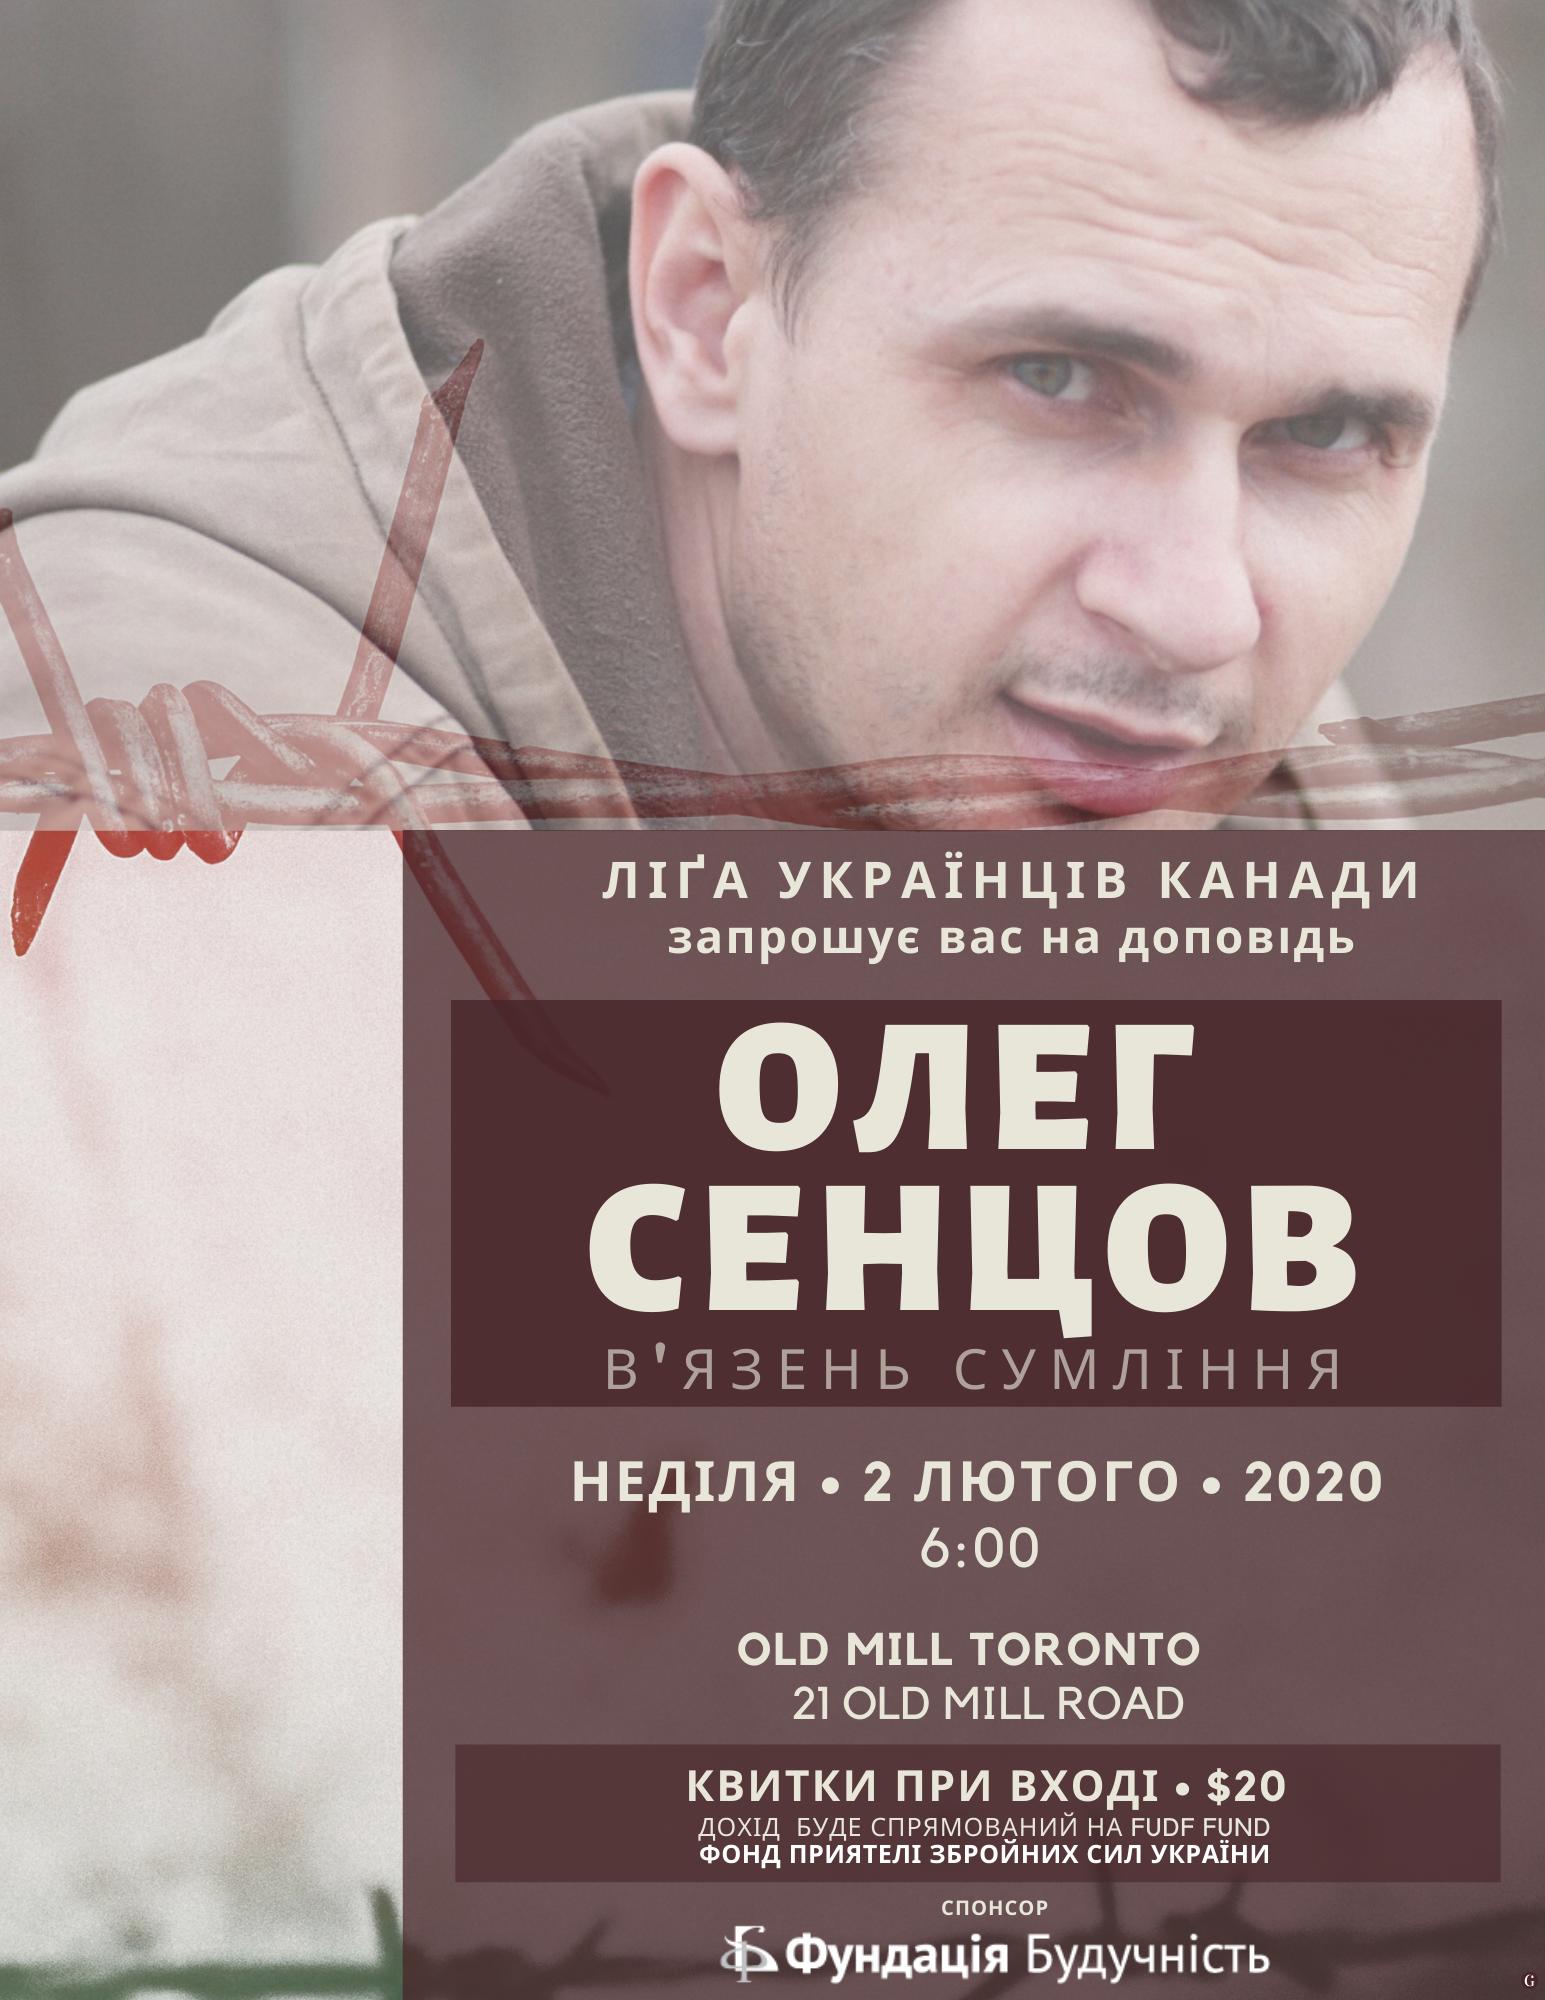 Sentsov Event Poster